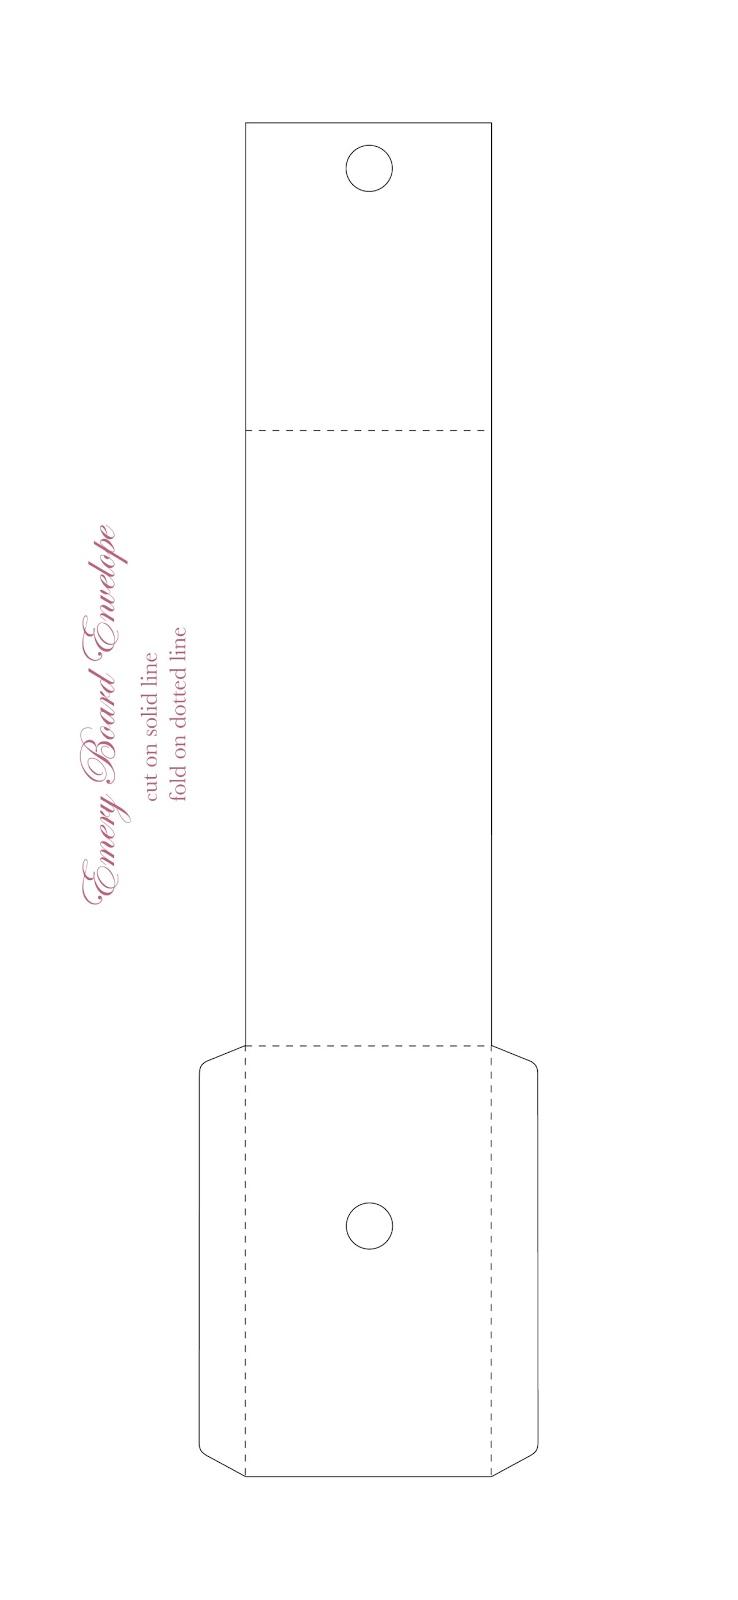 Kell belle studio emery board envelope for Legal size envelope template